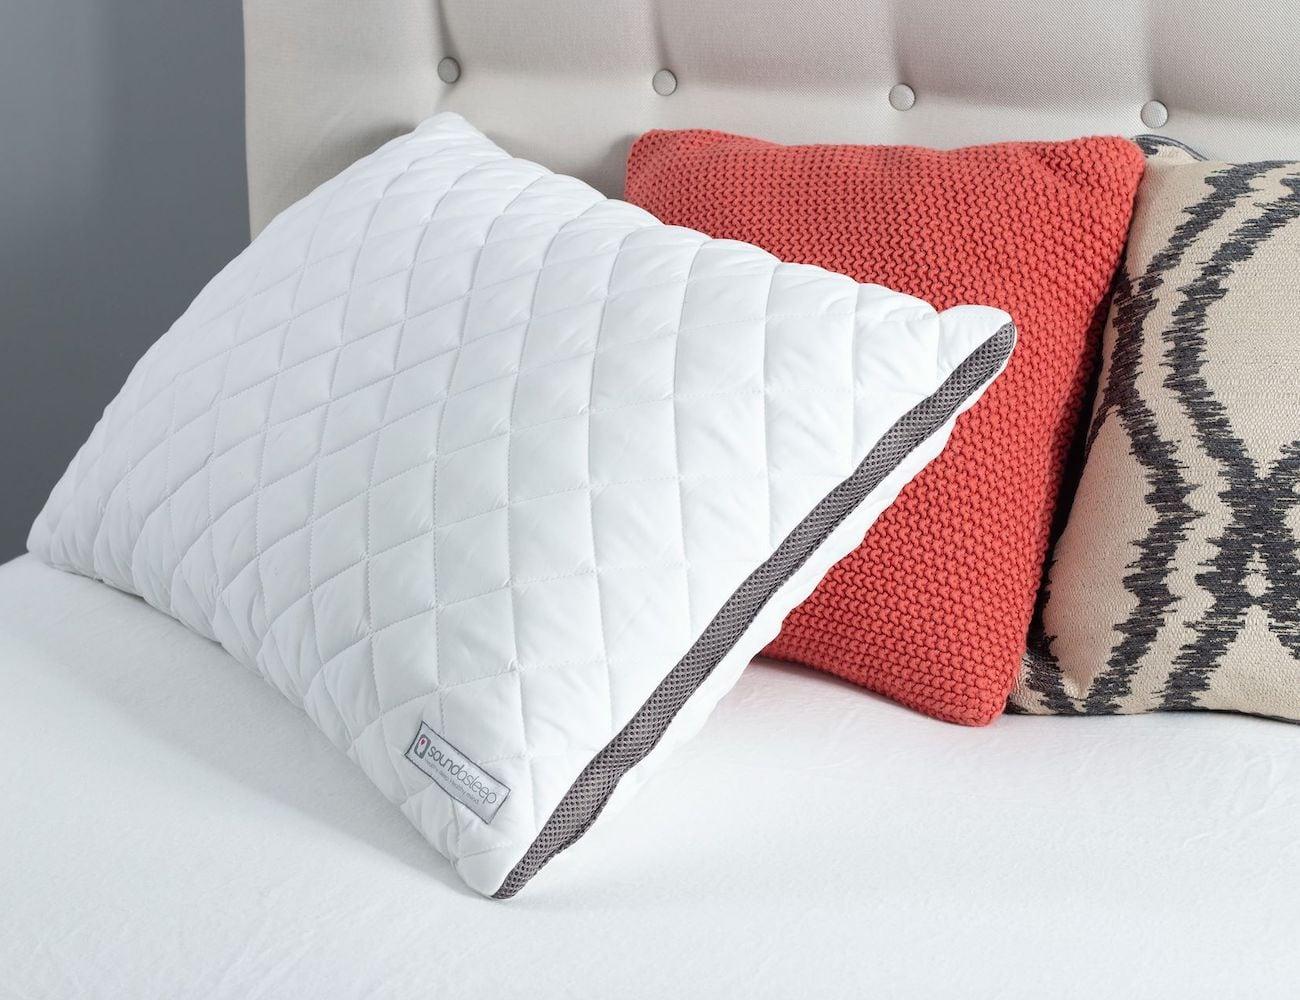 10 Sleep tech gadgets to help you get some shuteye - soundsleep 04